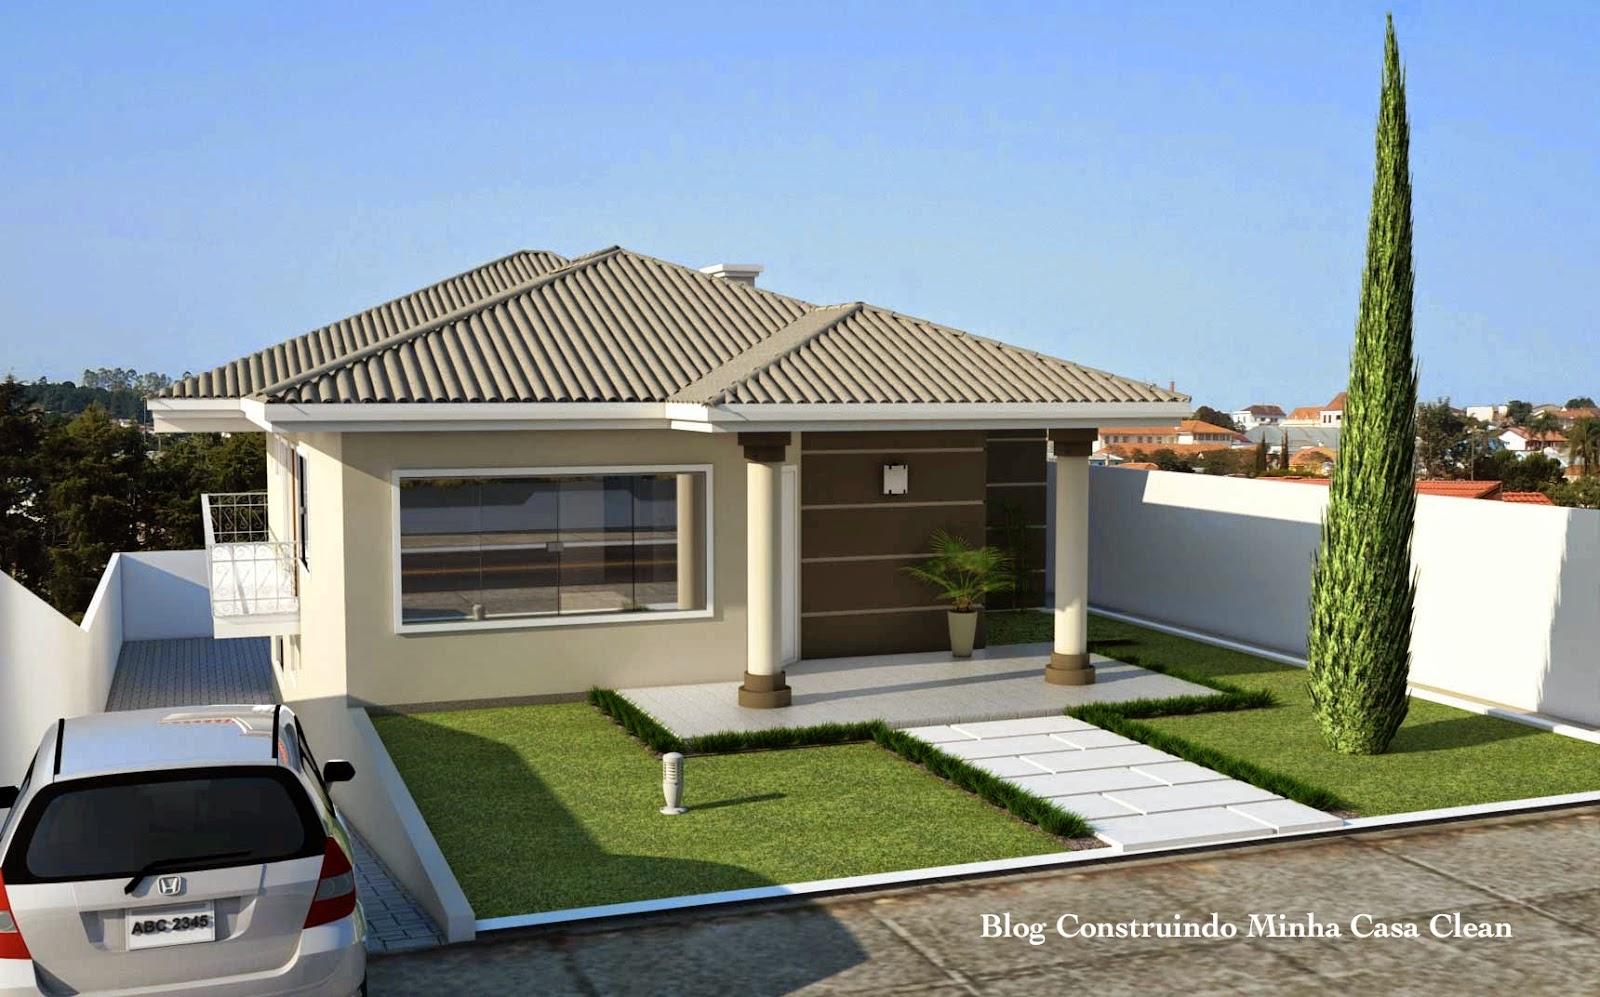 Construindo minha casa clean fachadas de casas em for Tipos de casas para construir